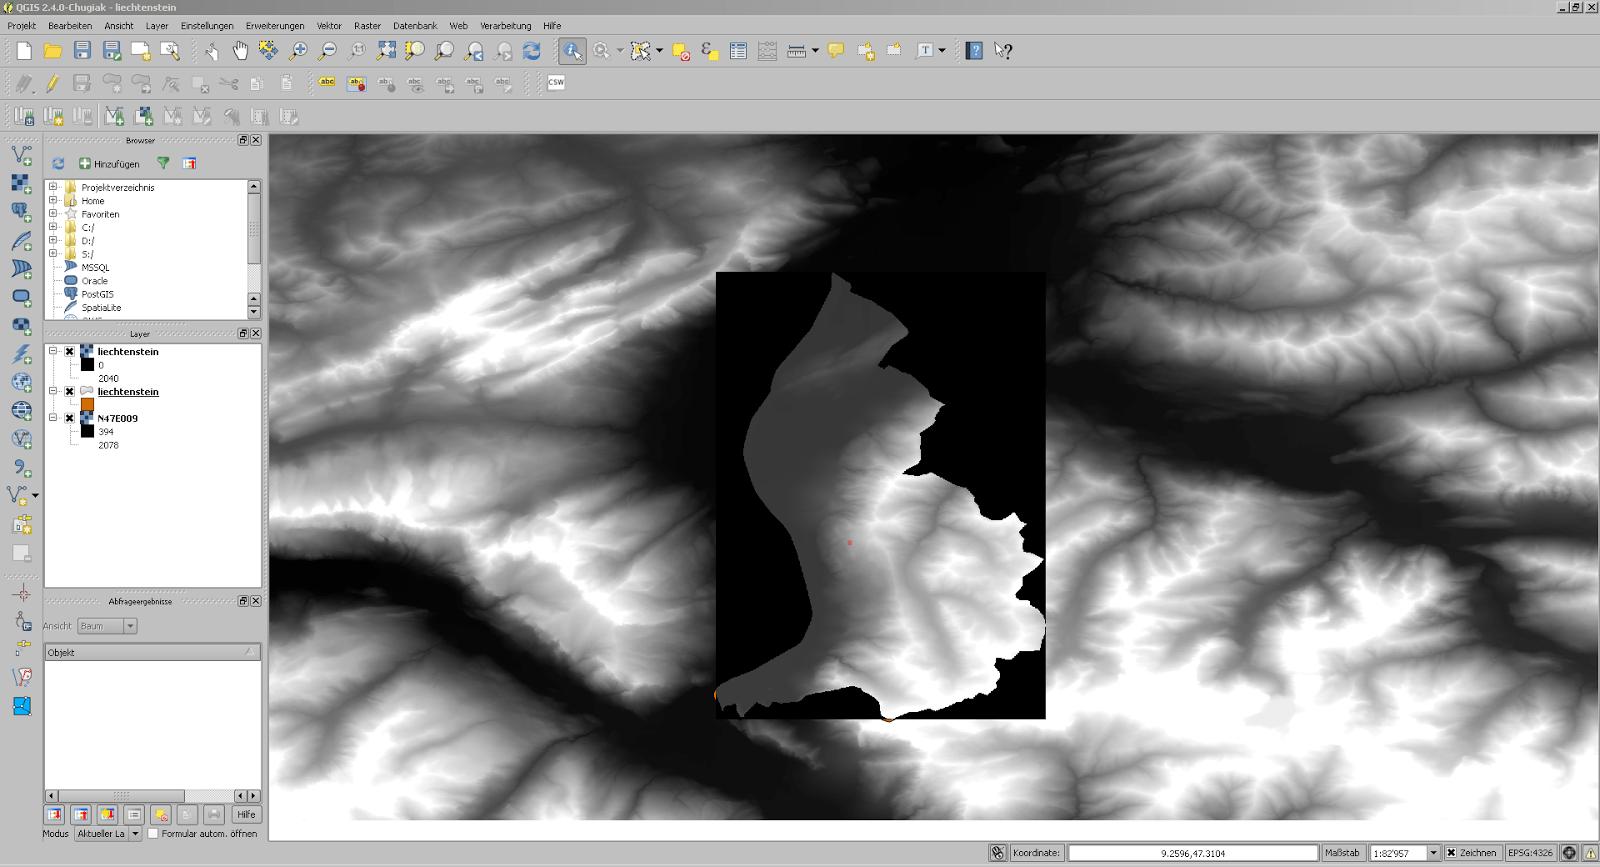 Screenshot aus QGIS mit dem neu aus den Höhendaten ausgeschnittenen Datensatz